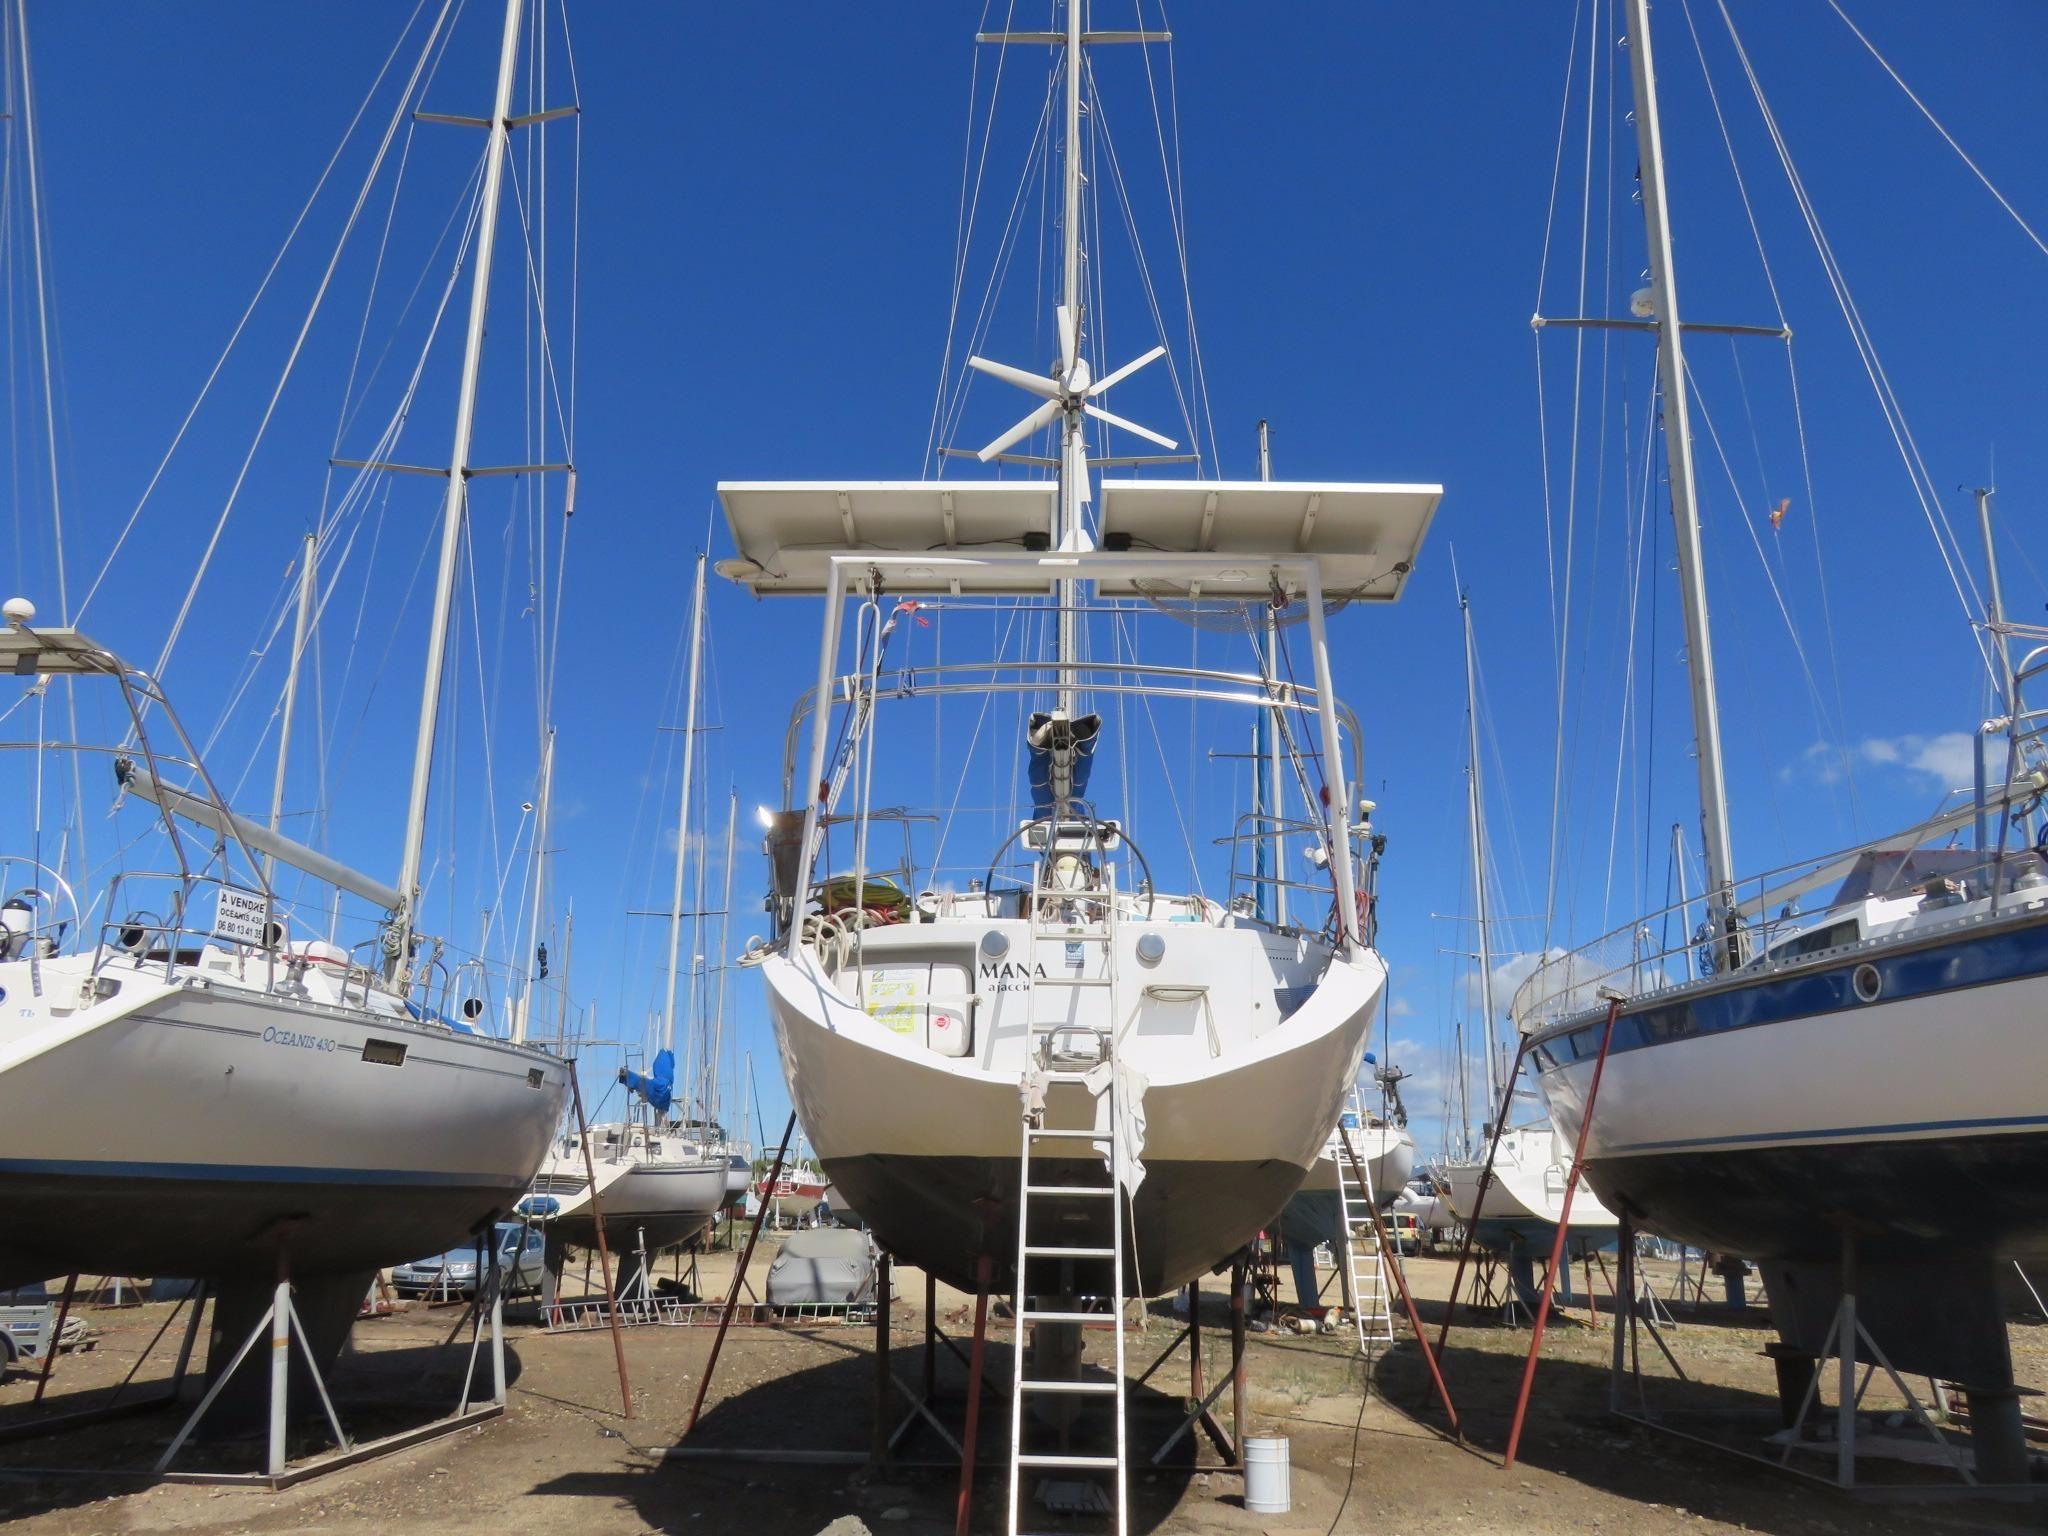 1993 dujardin atlantis 430 sail boat for sale www